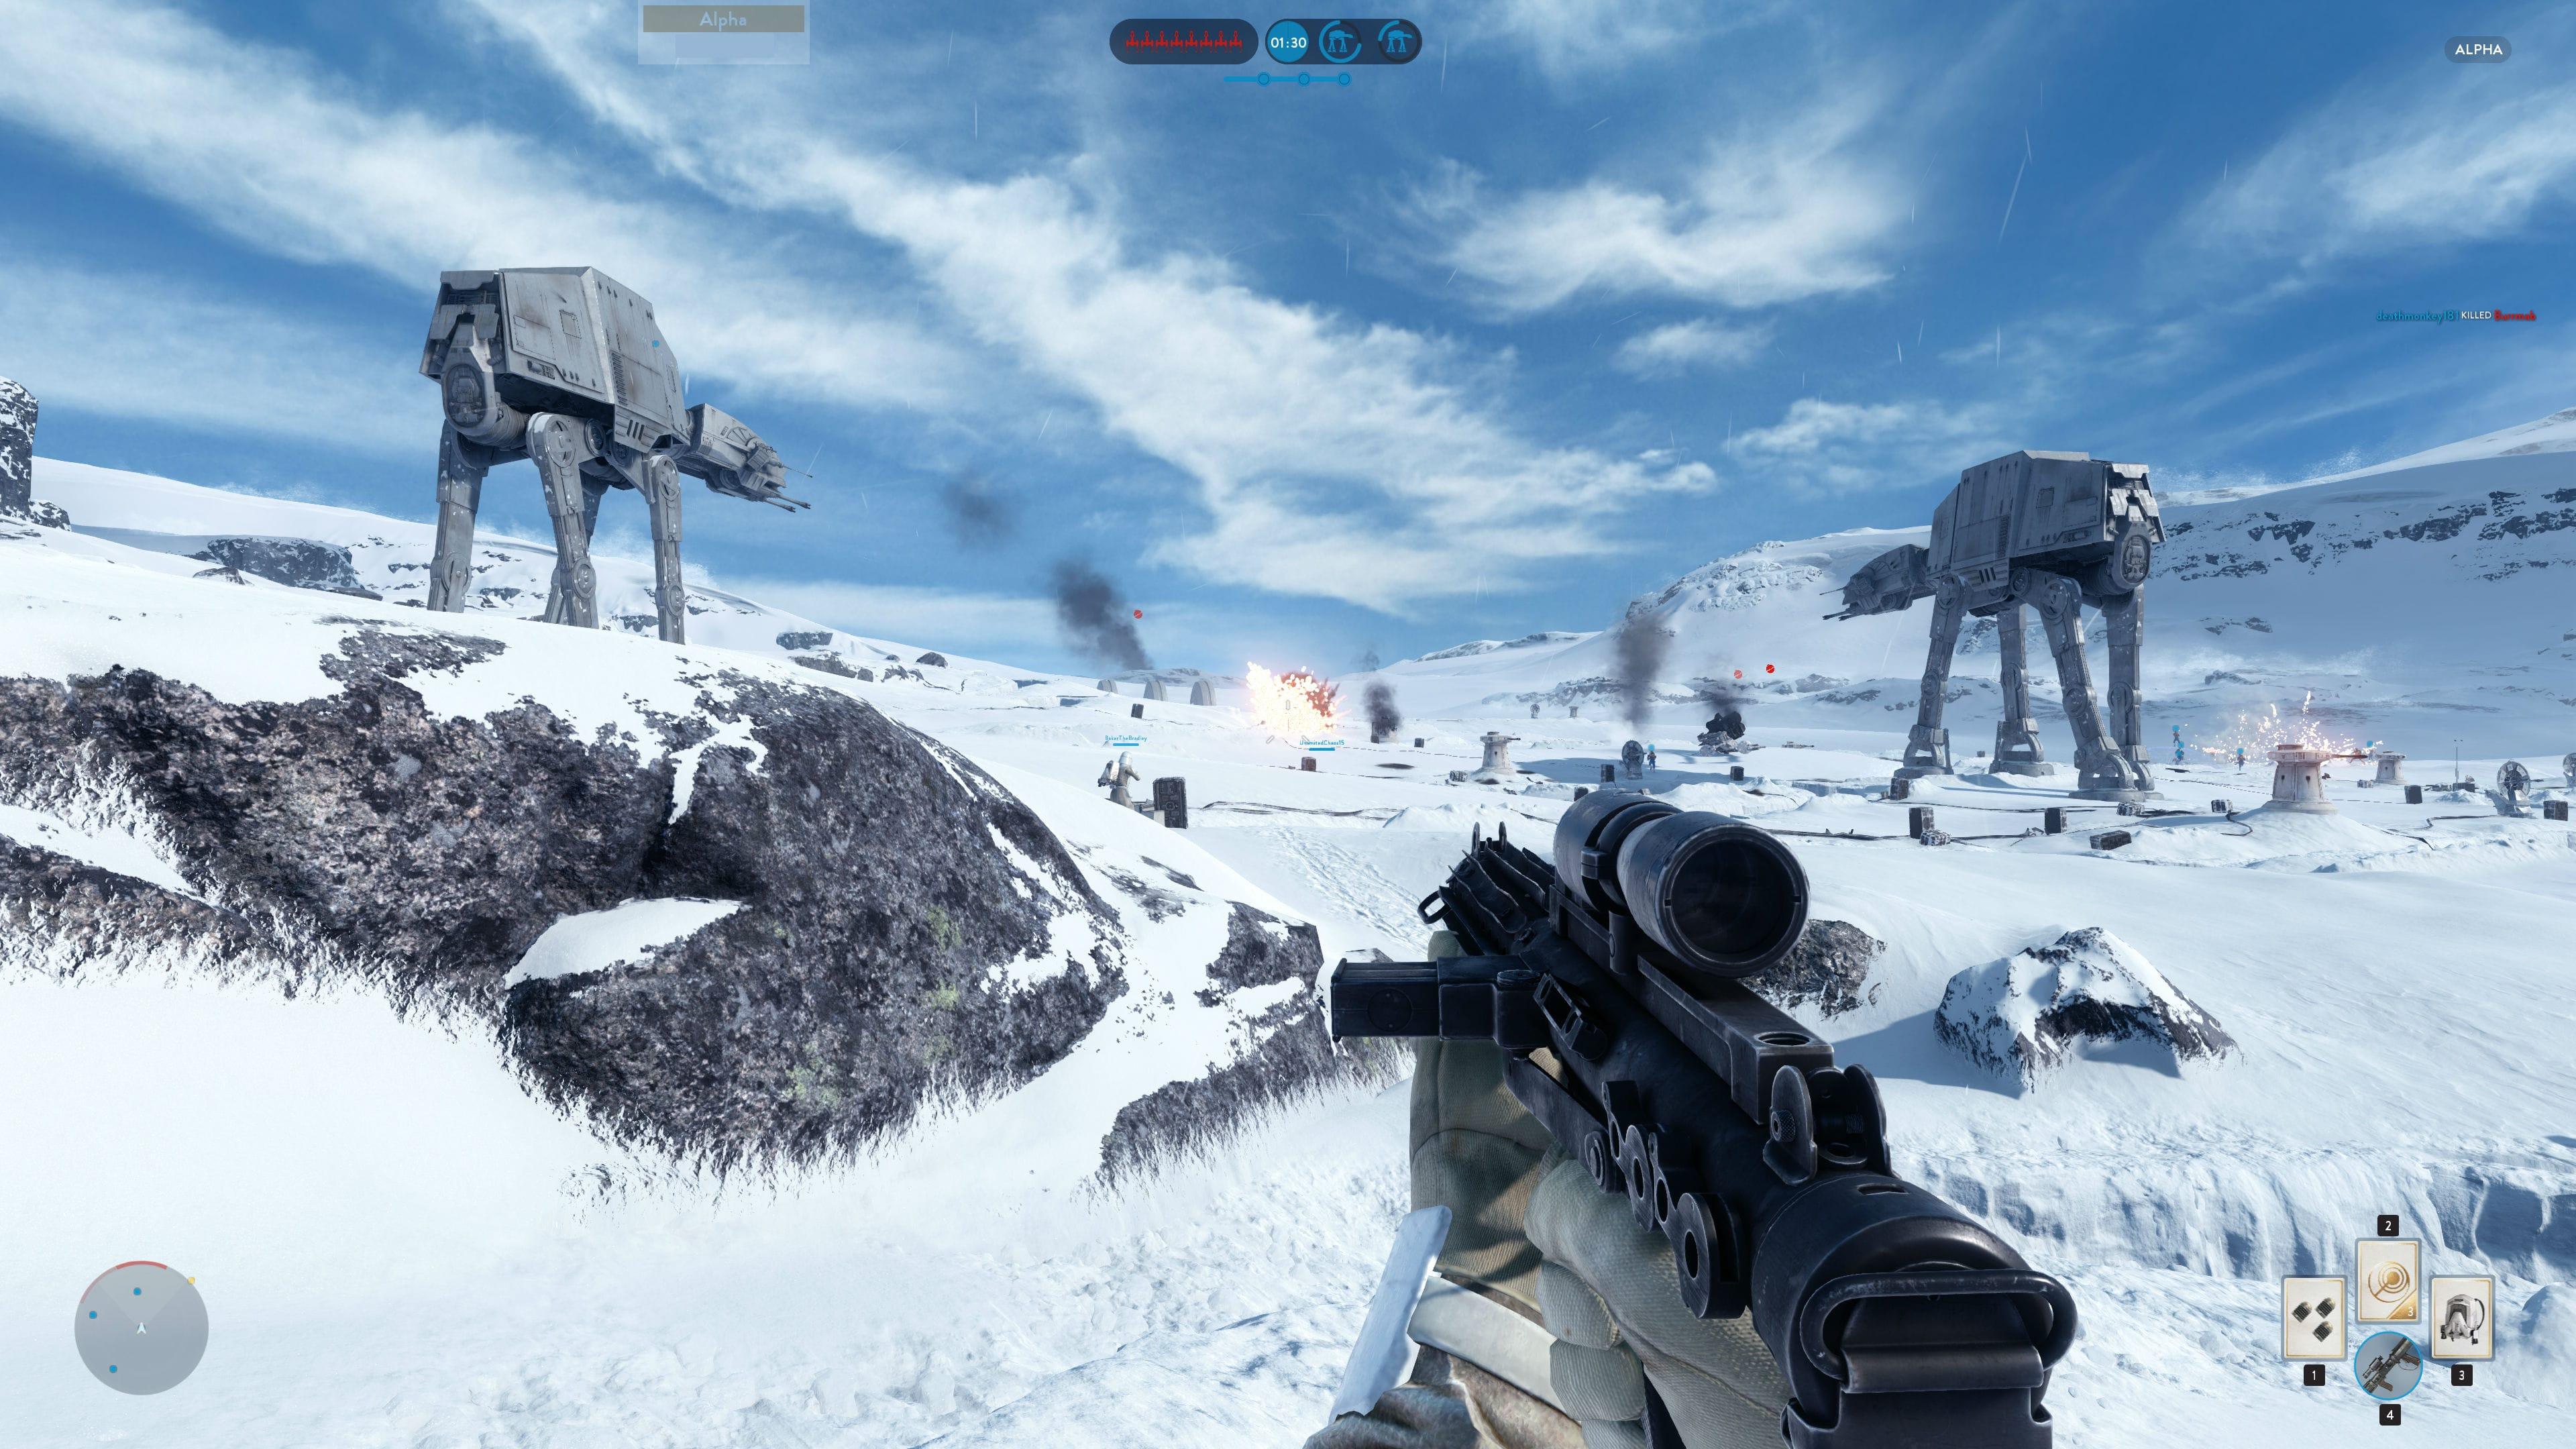 star wars:battlefront